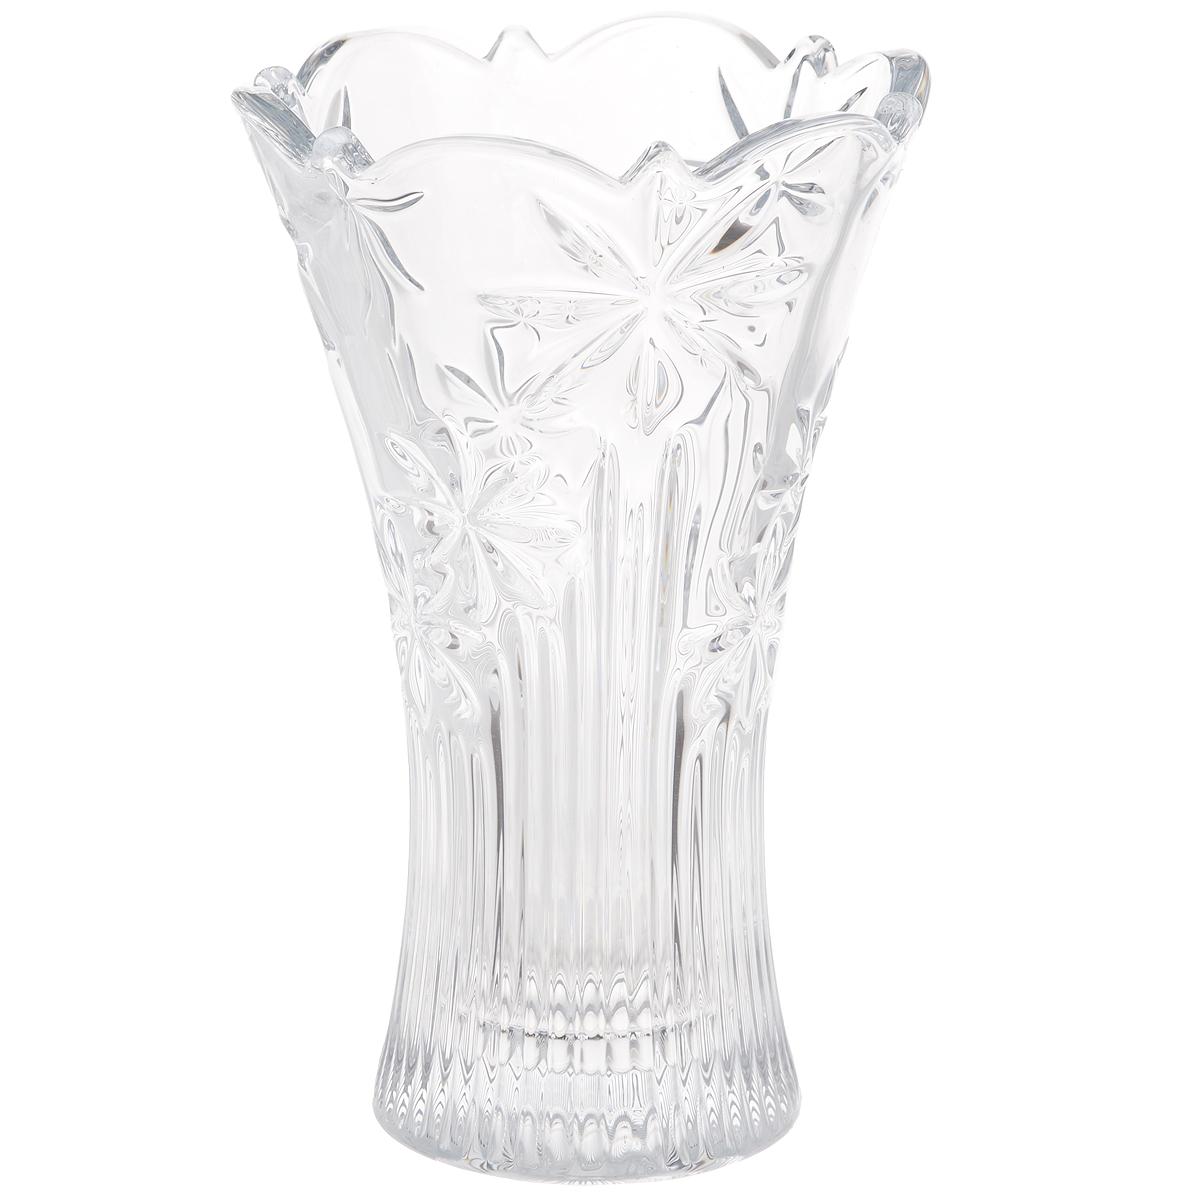 Ваза Crystalite Bohemia Персей, высота 20,5 см ваза 30 см crystalite bohemia ваза 30 см